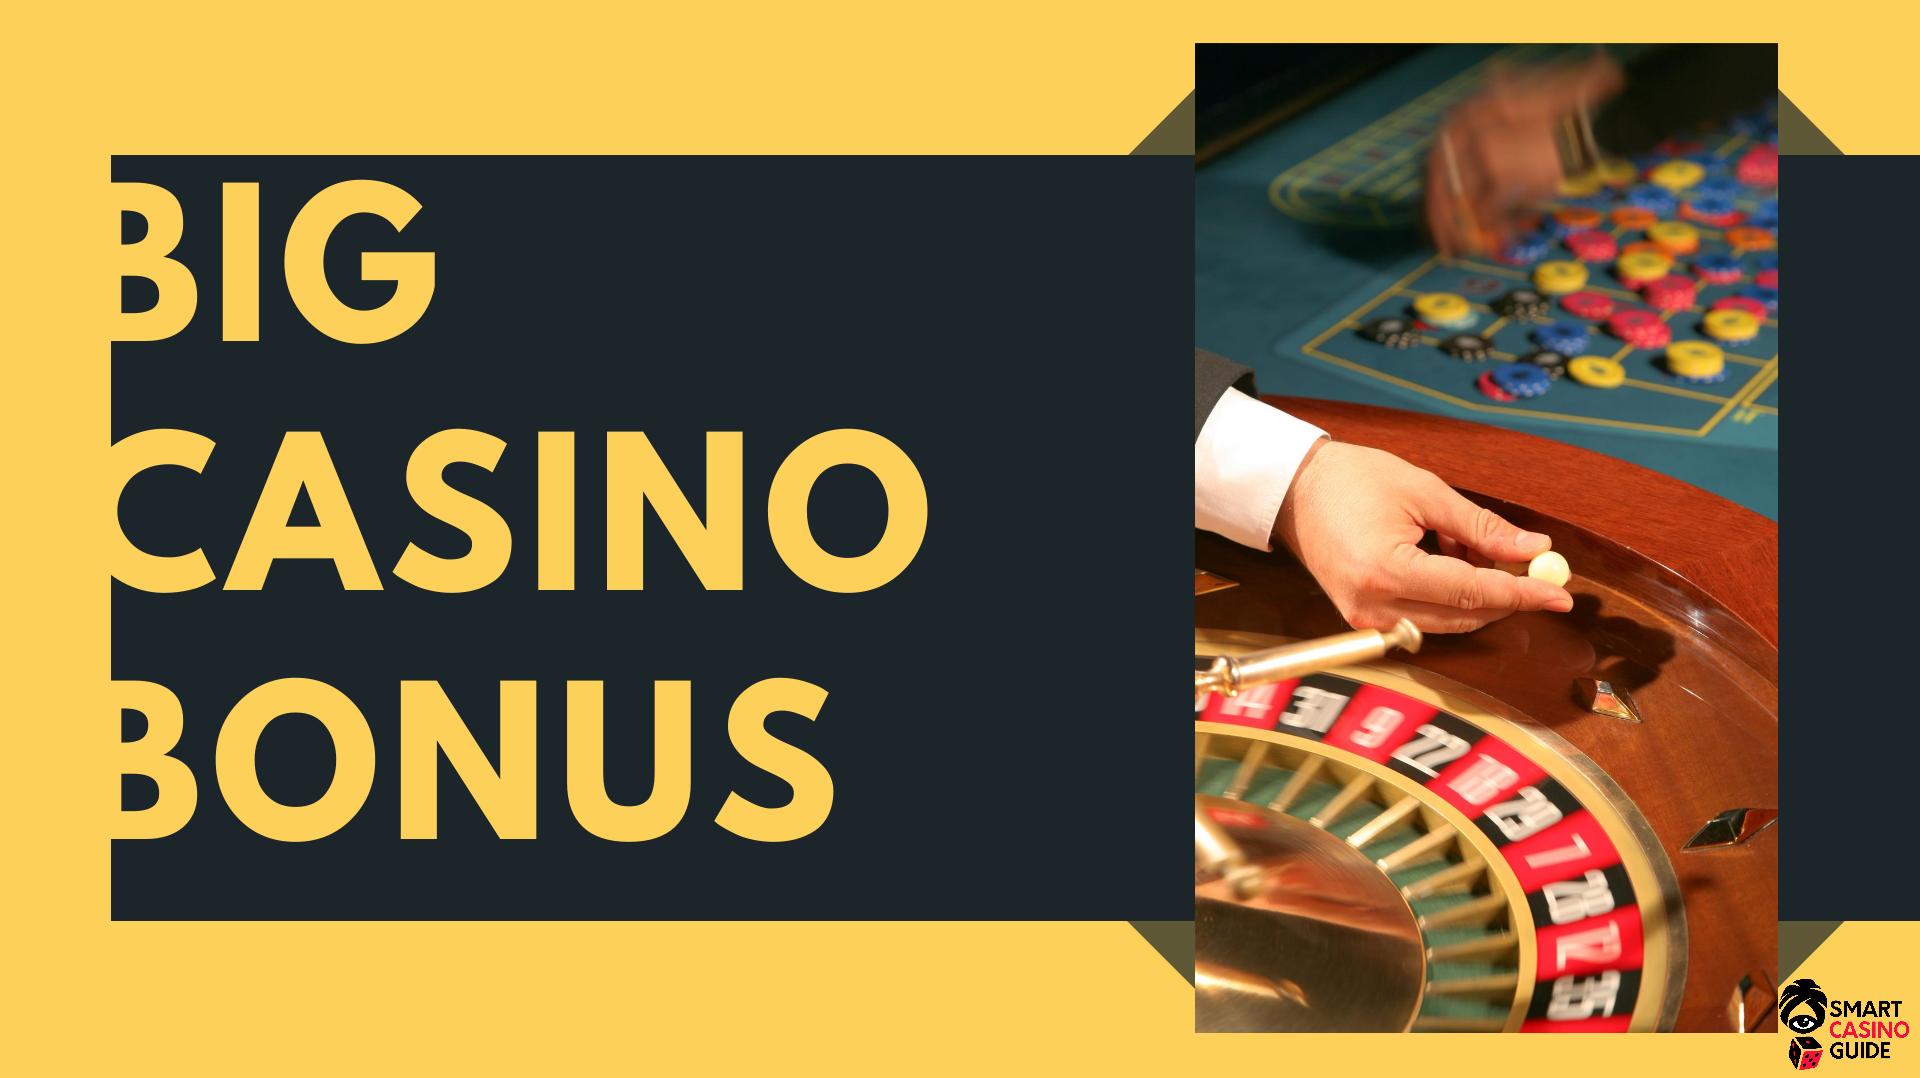 Top 10 ecopayz online casinos (2020) with top bonuses